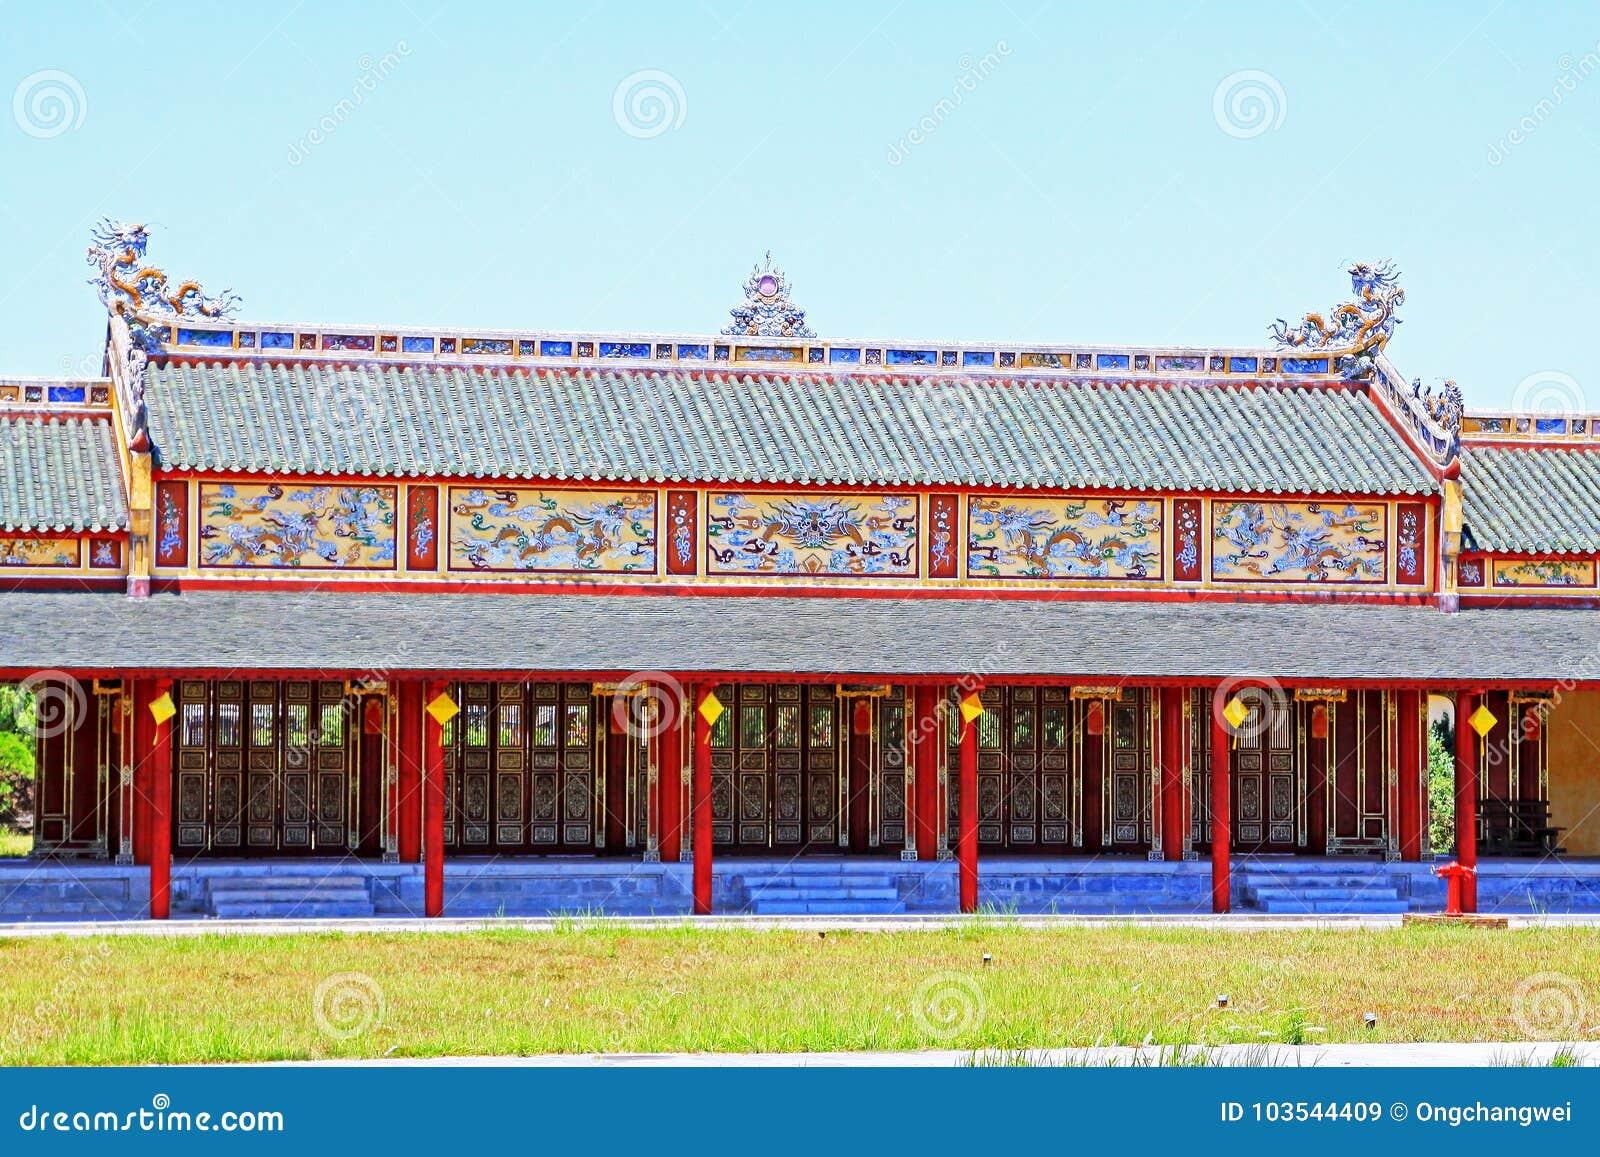 Hue Imperial City, Vietnam UNESCO World Heritage